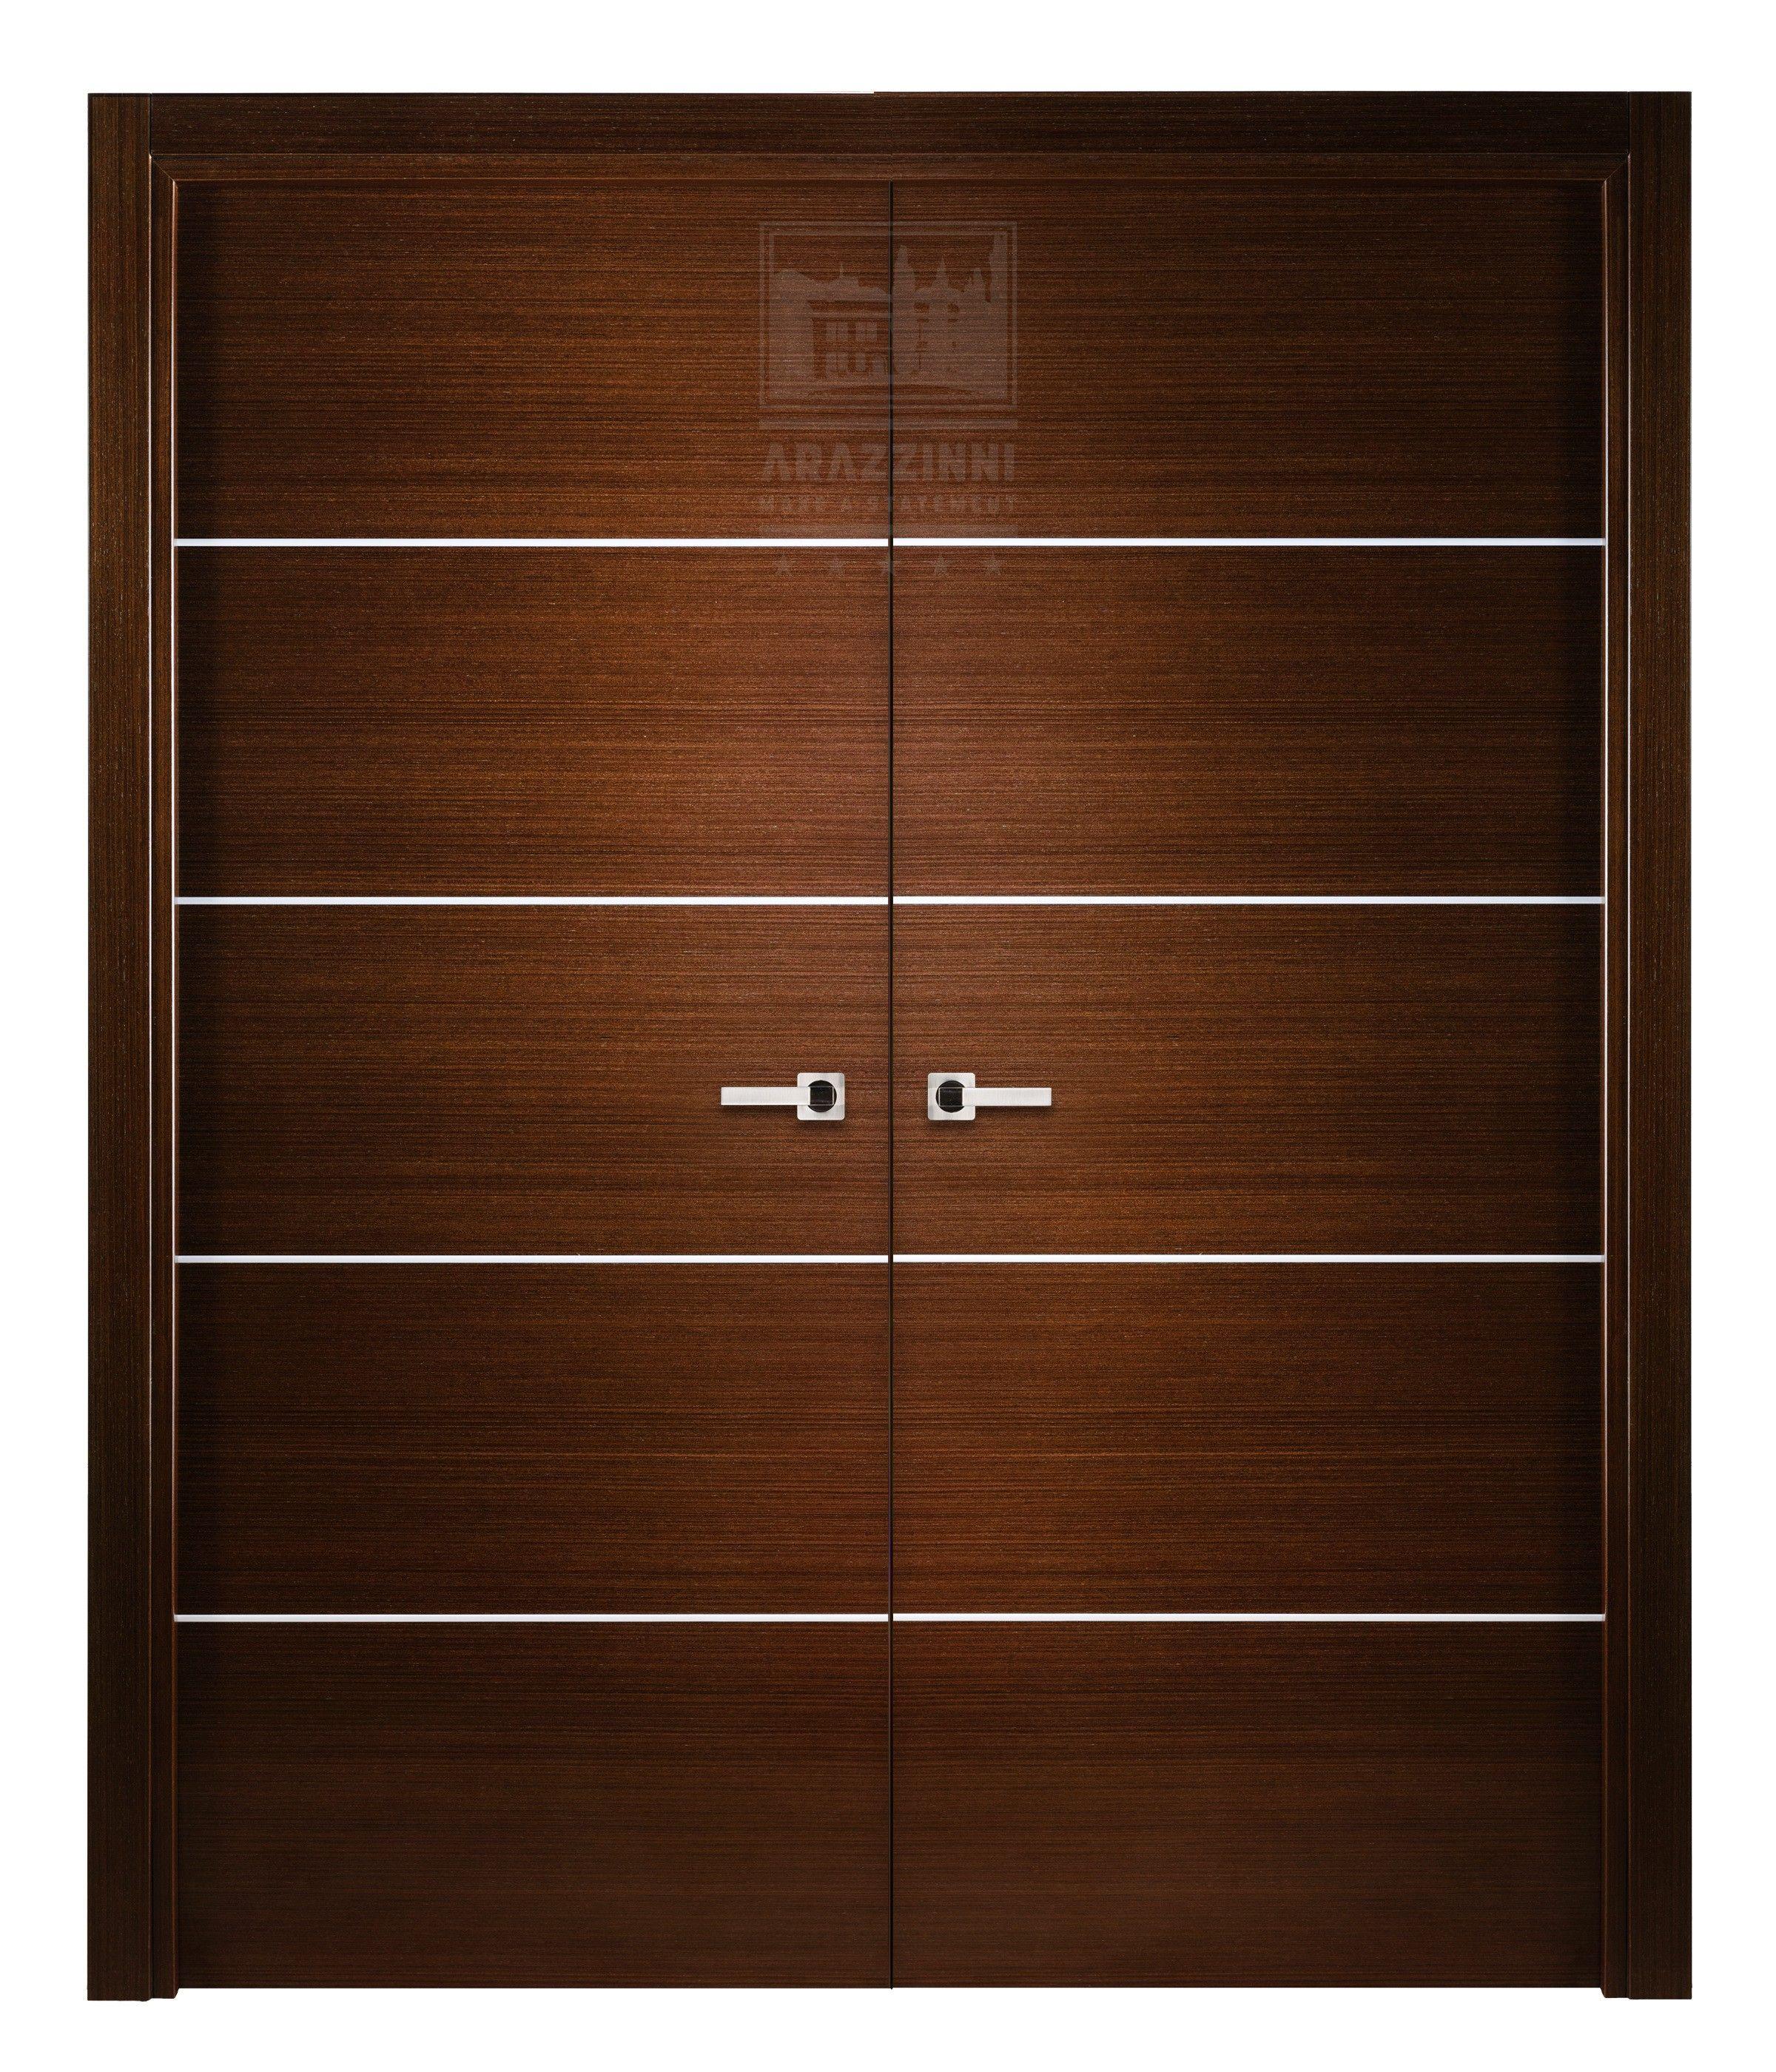 Popular Arazzinni Mia Interior Double Door Wenge